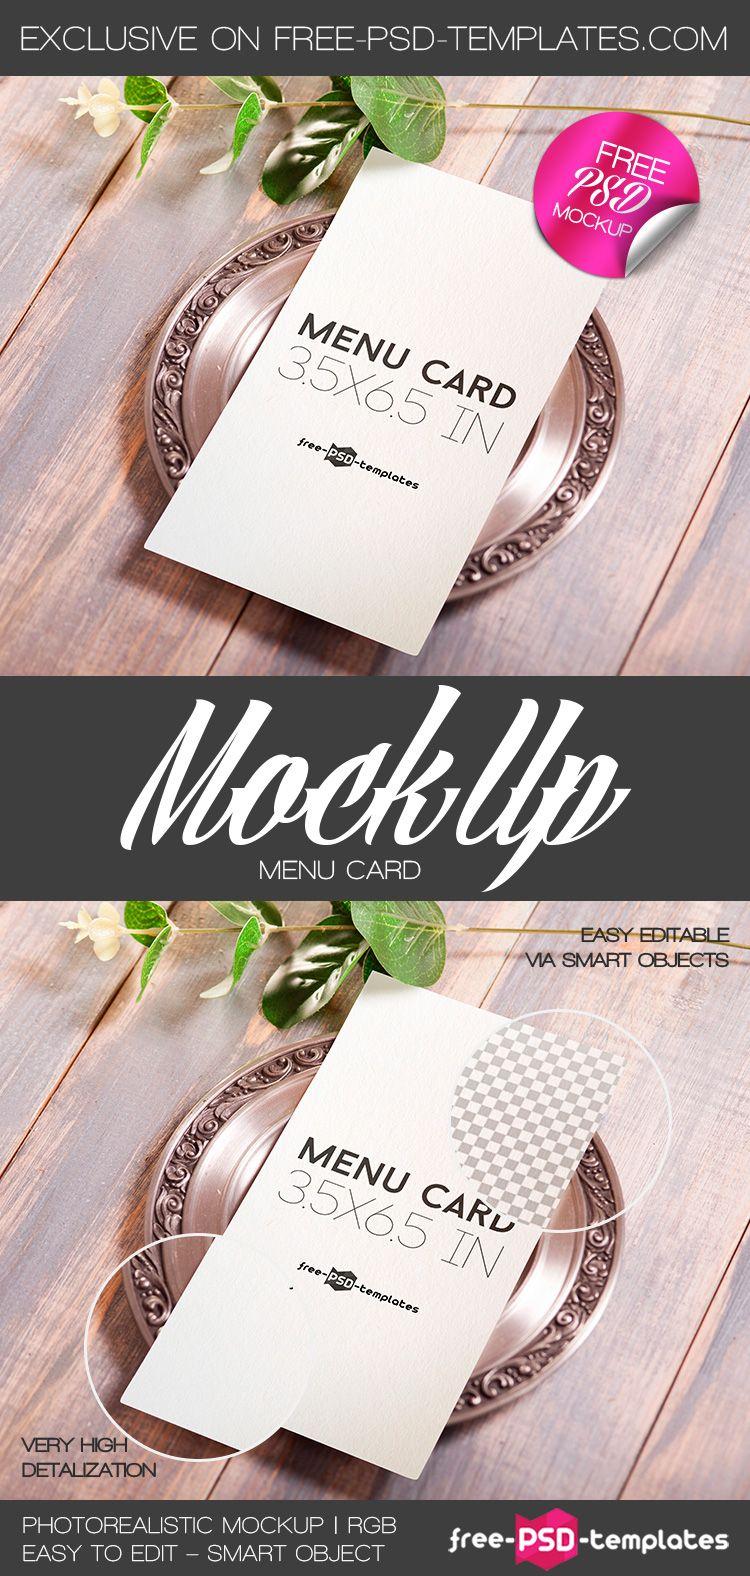 Free Menu Card Mock Up In Psd Free Psd Templates